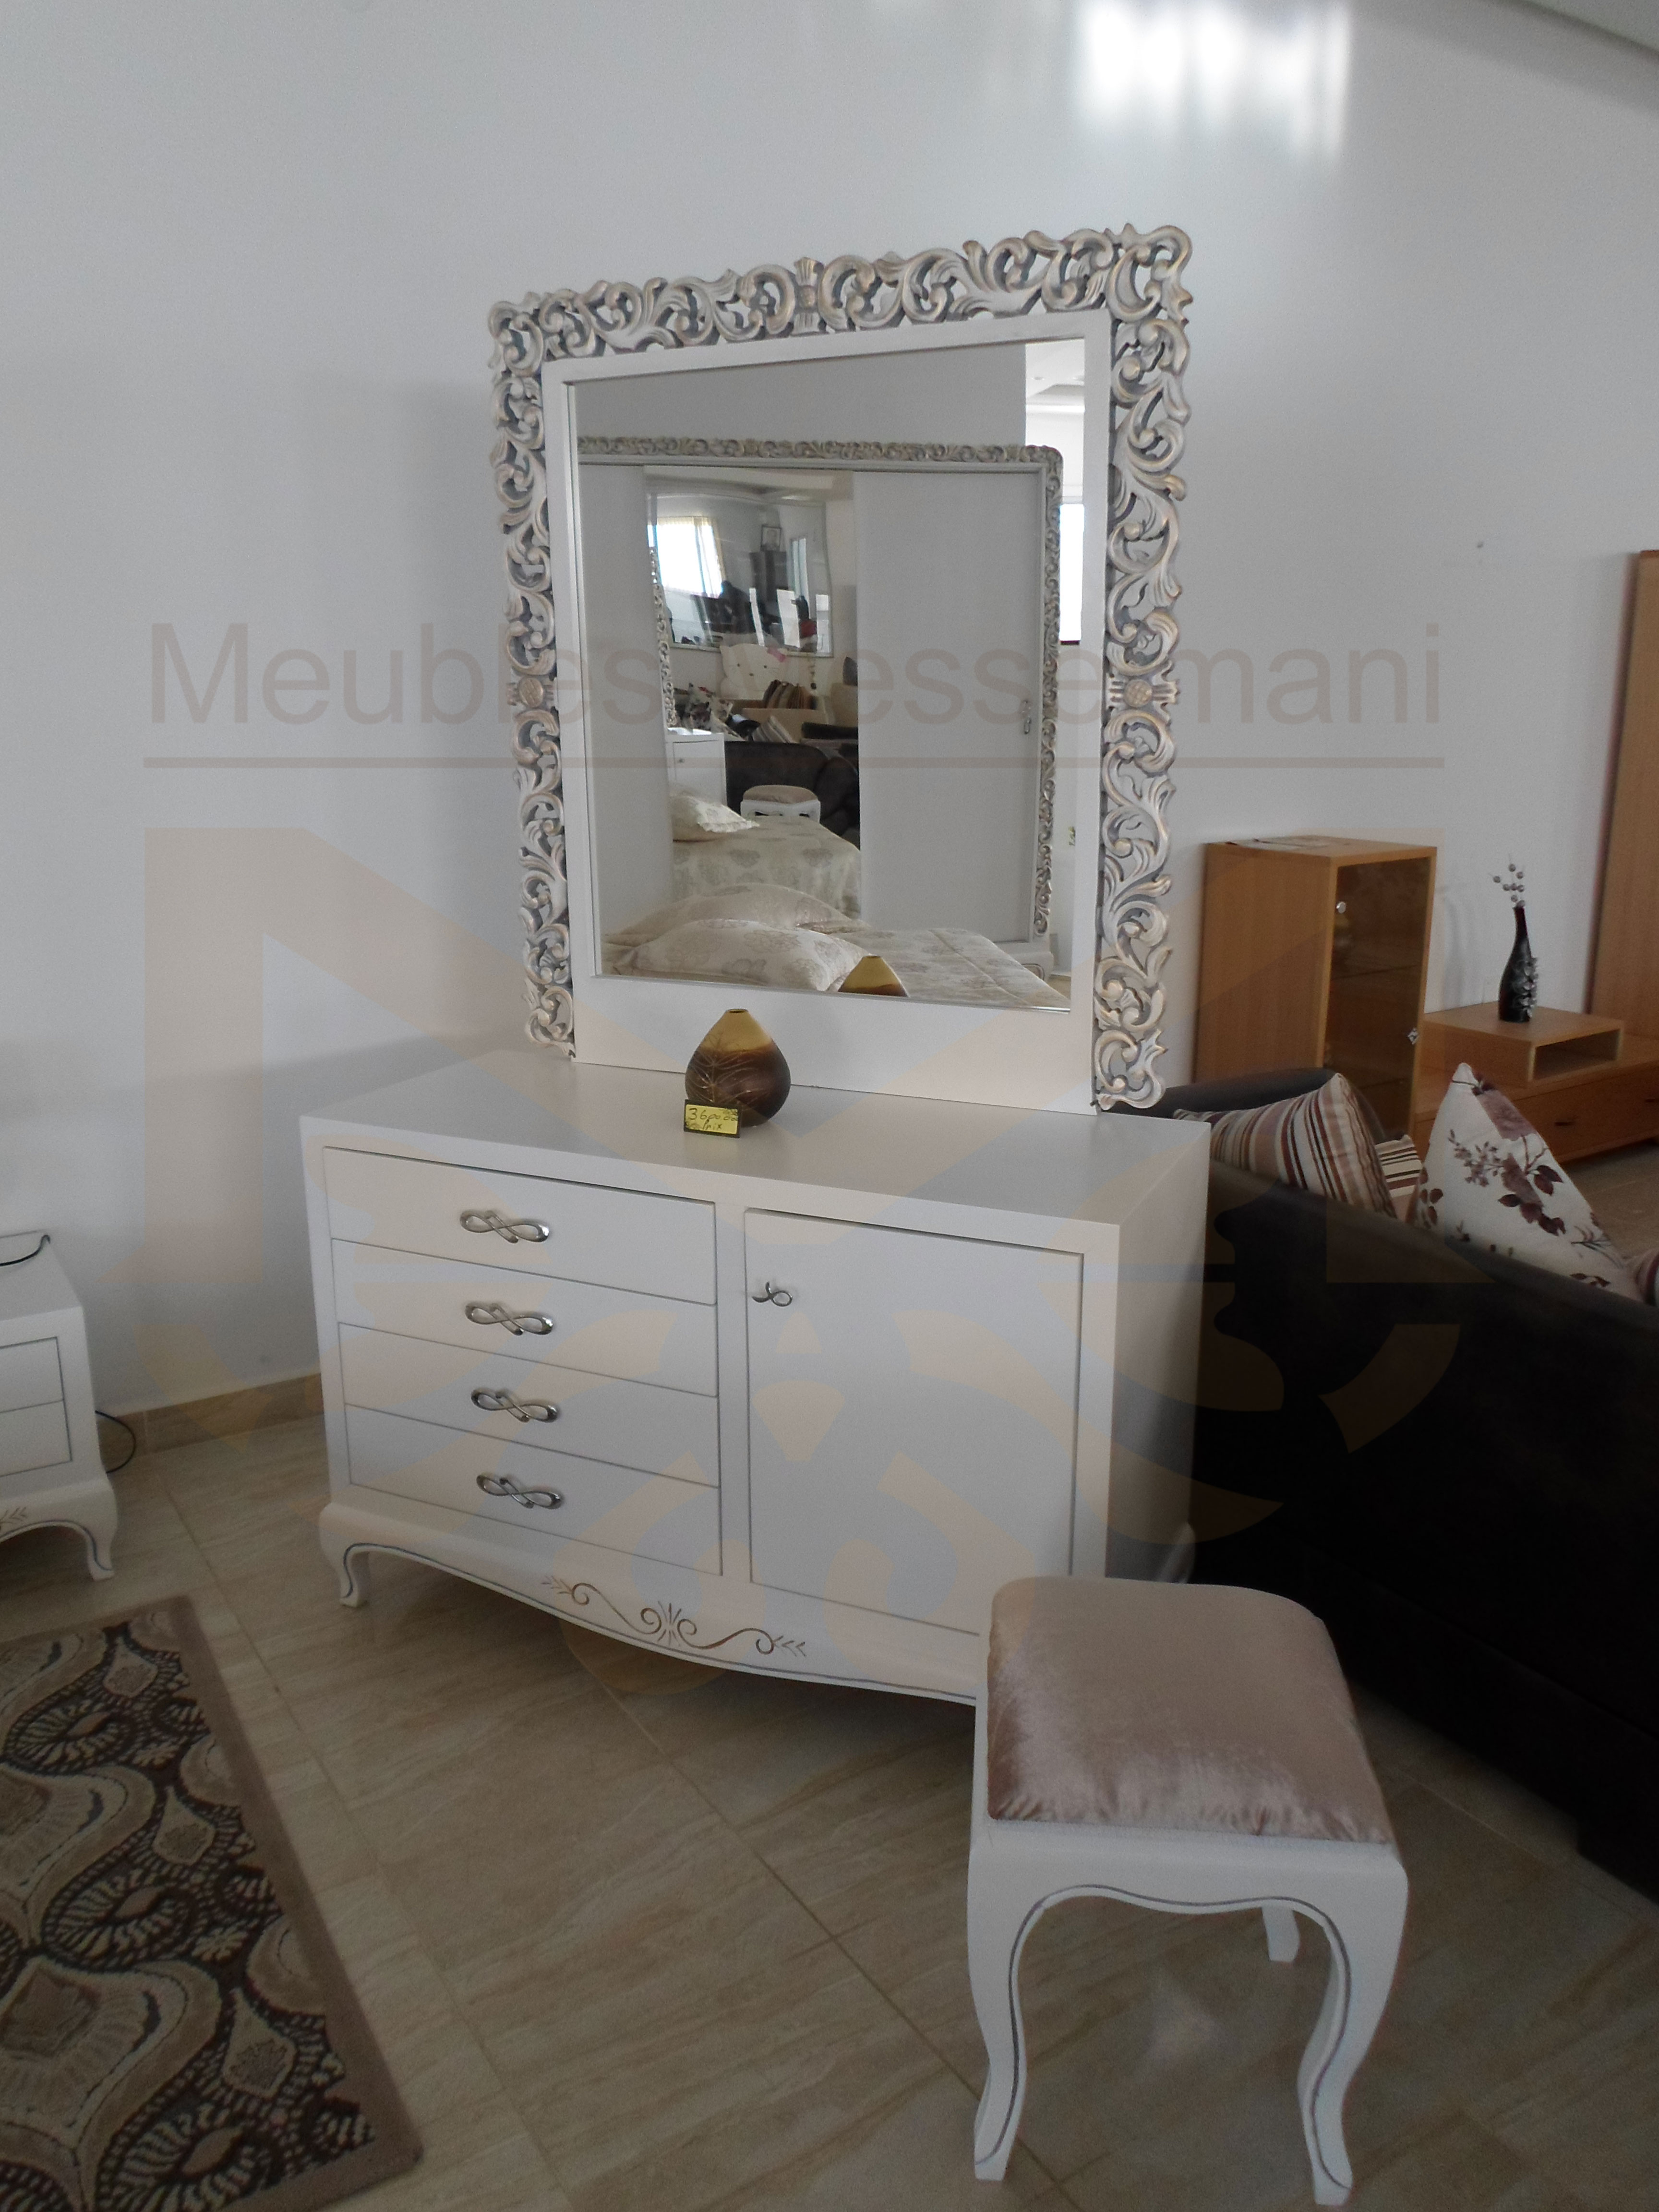 chambre coucher prestige meubles k libia messelmani